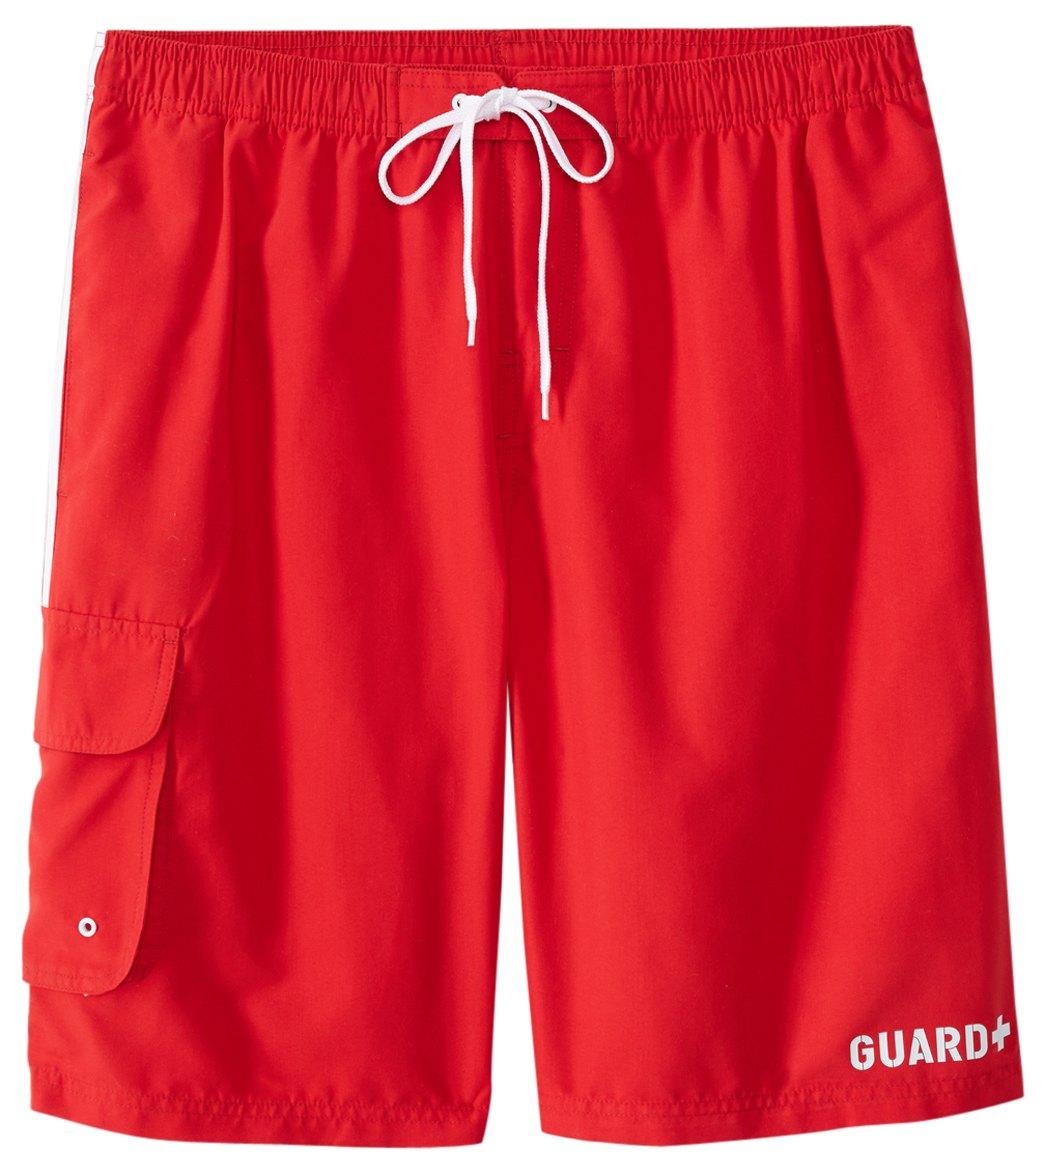 swim shorts sporti guard menu0027s cargo swim trunk at swimoutlet.com bsziupv